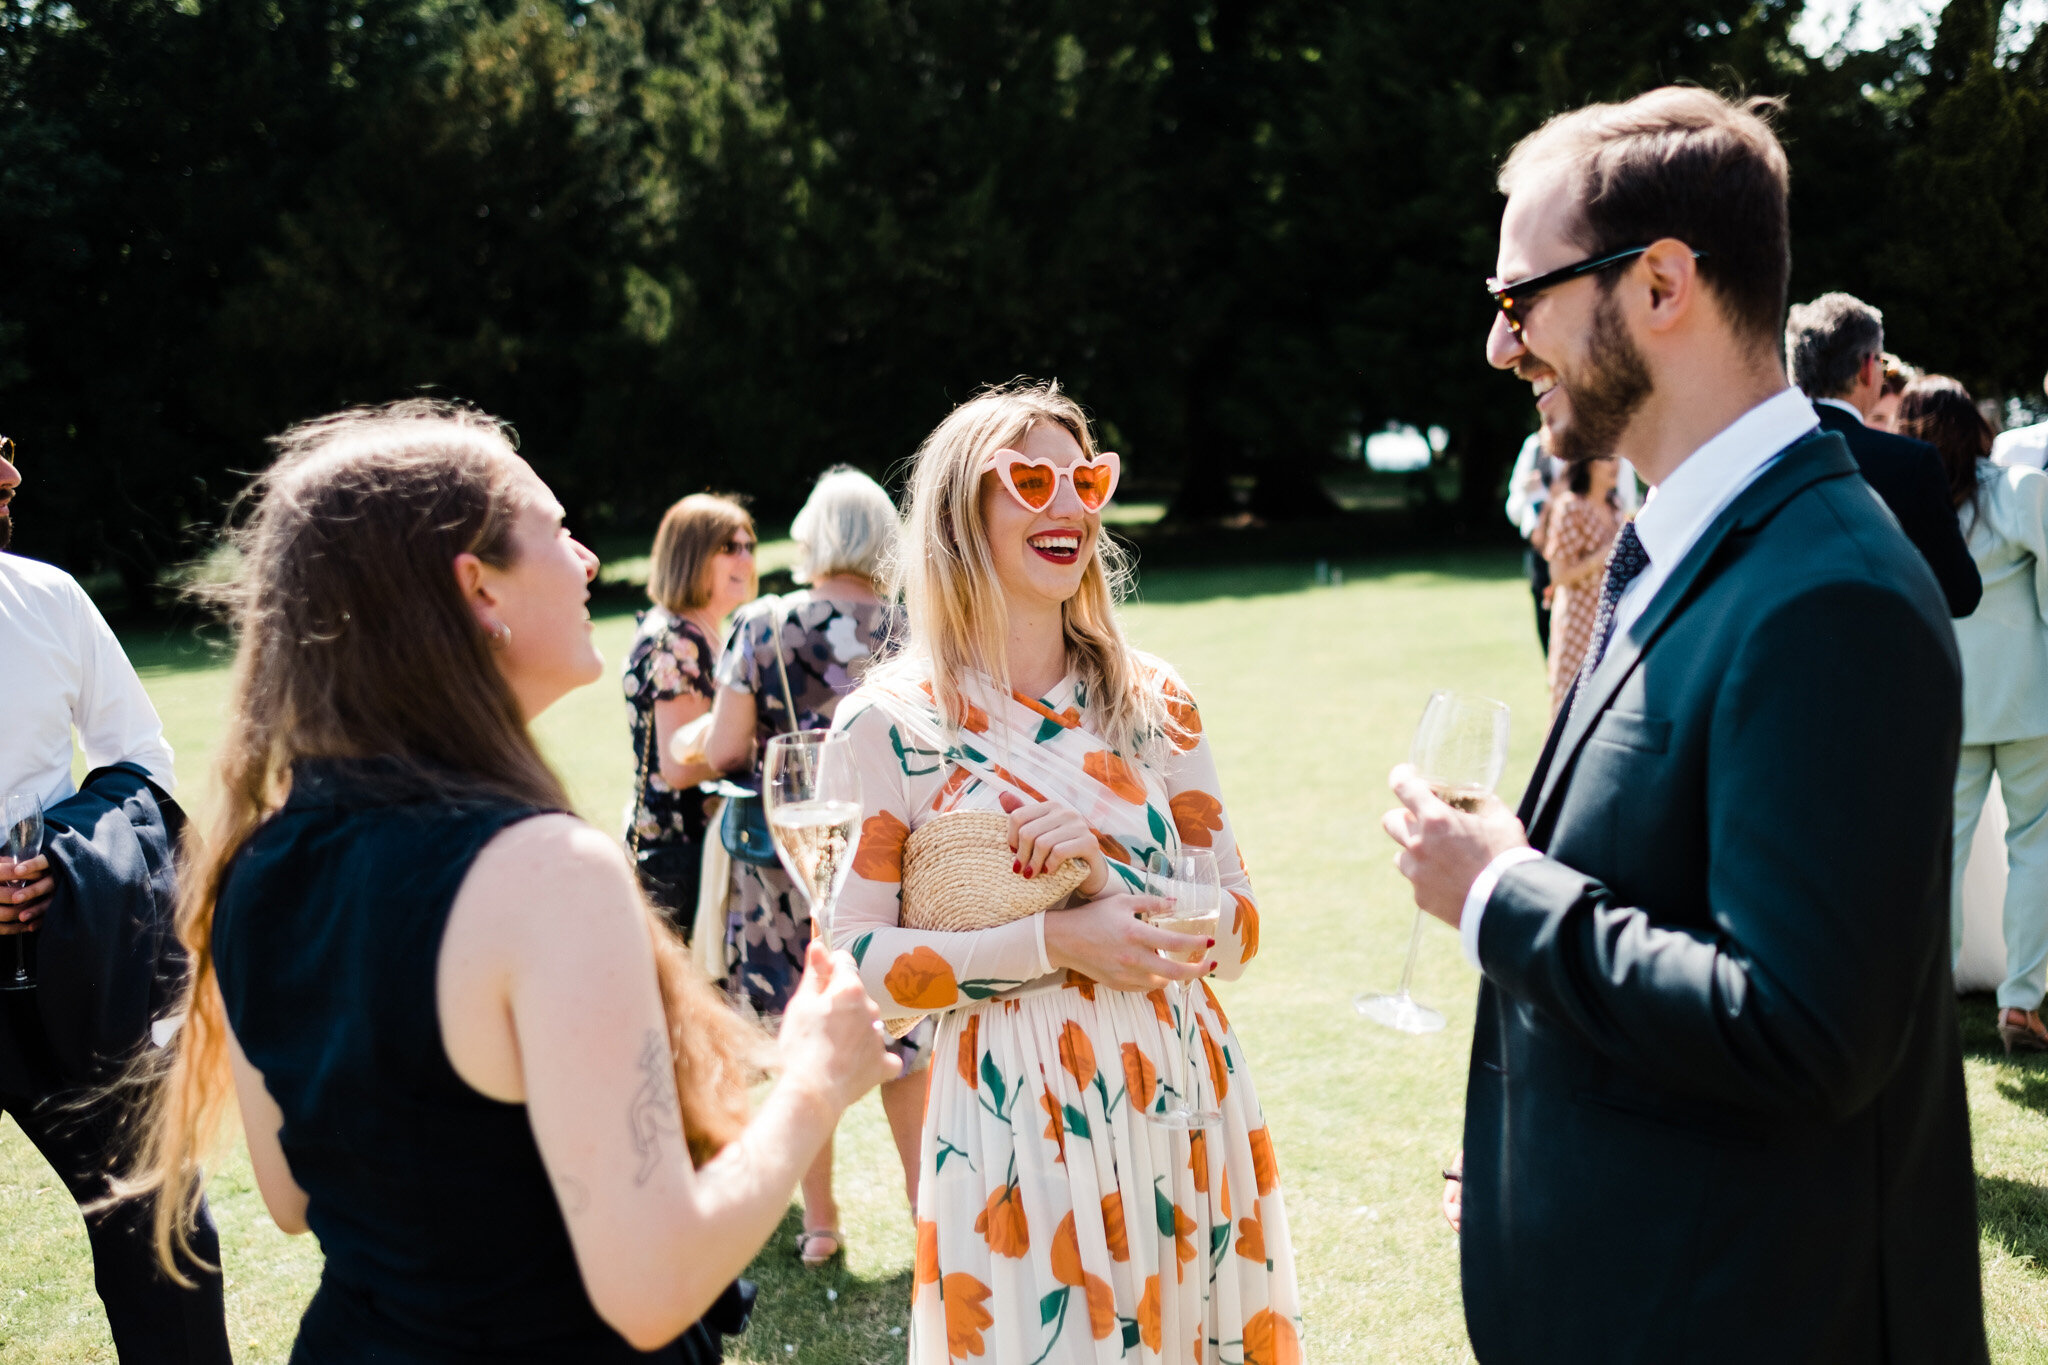 Scott-Stockwell-Photography-wedding-photographer-aynhoe-park-sun-glasses.jpg